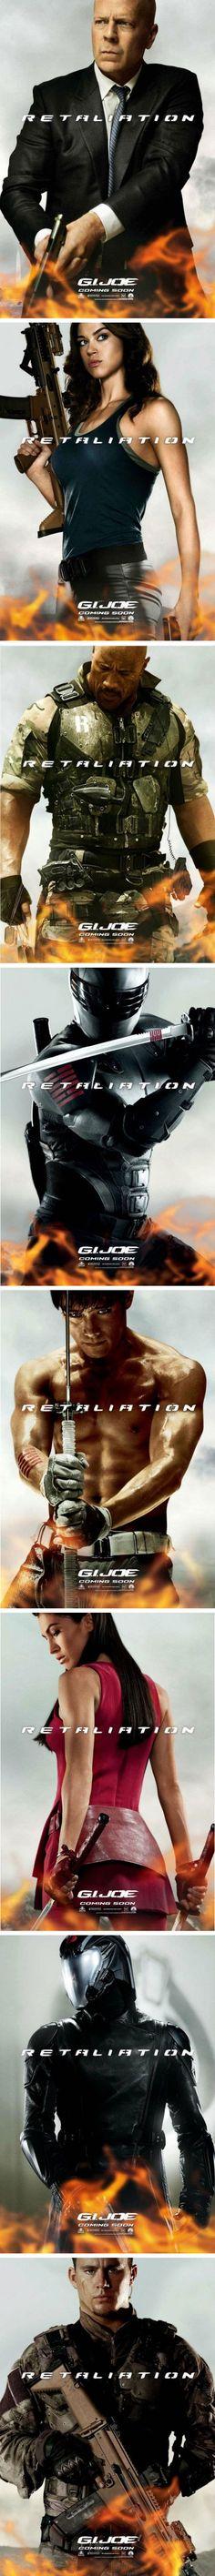 Posters [G.I. Joe: Retaliation]